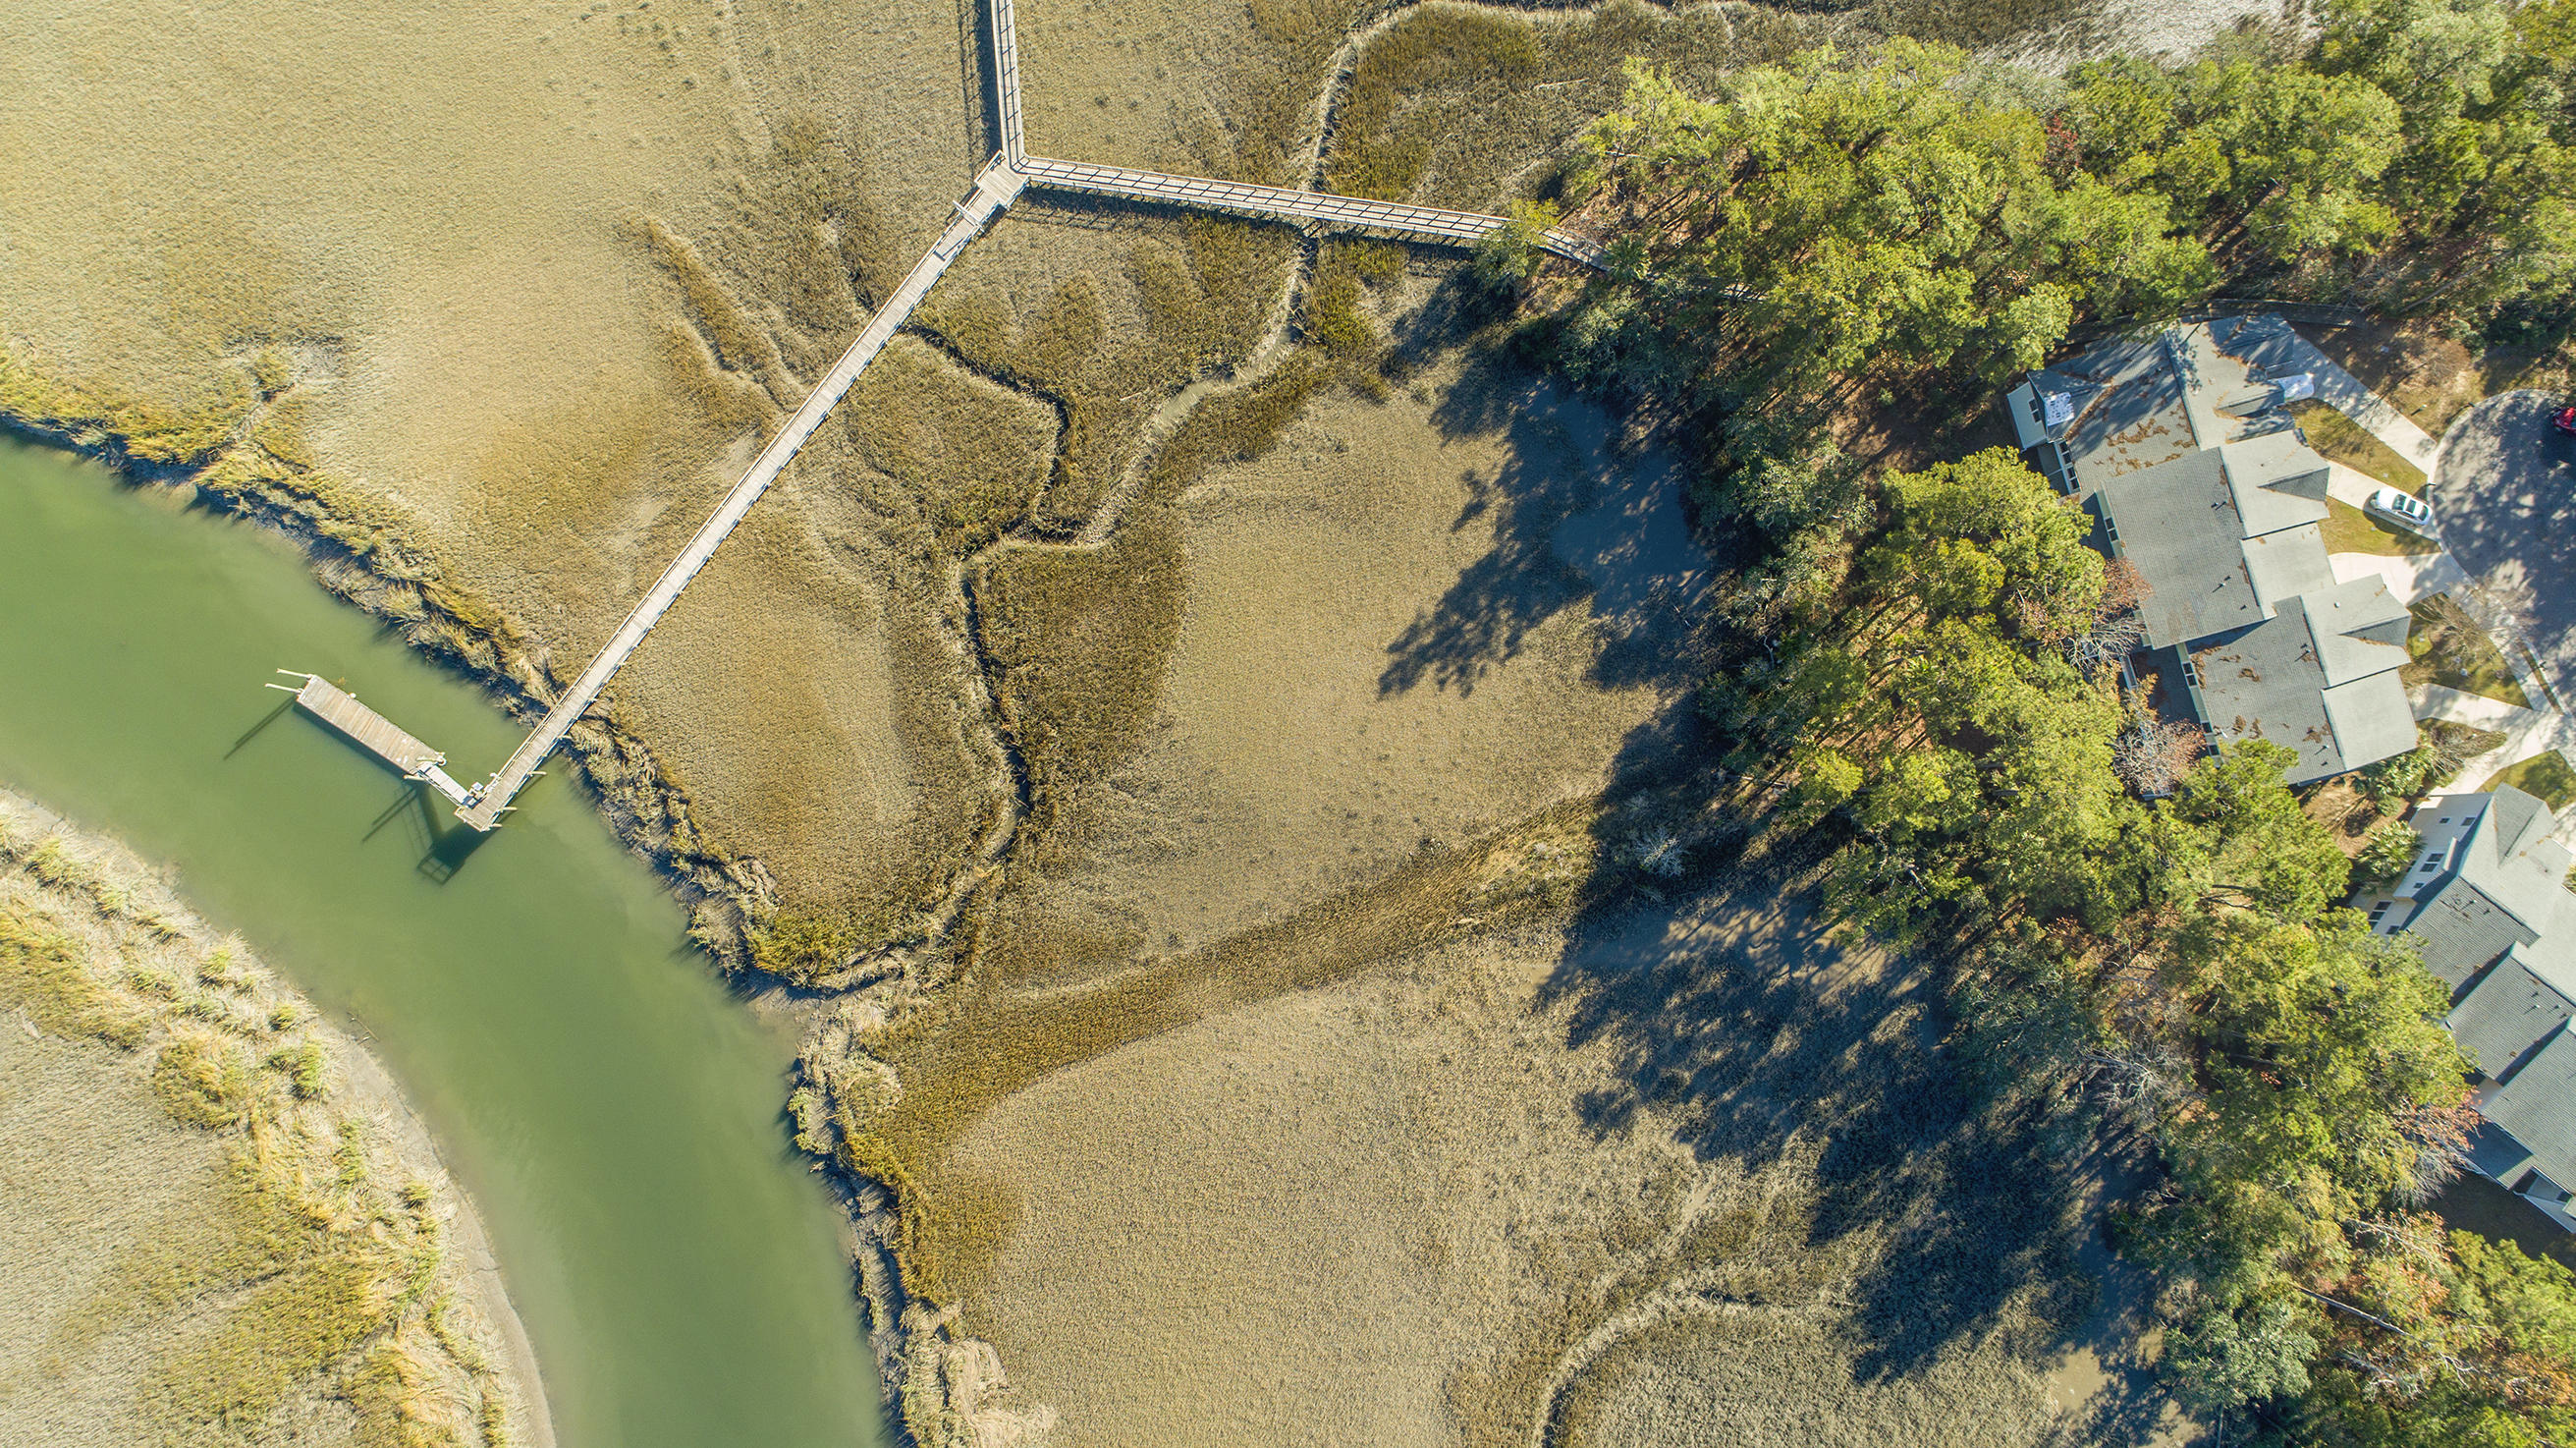 Etiwan Pointe Homes For Sale - 124 Winding Creek, Mount Pleasant, SC - 36